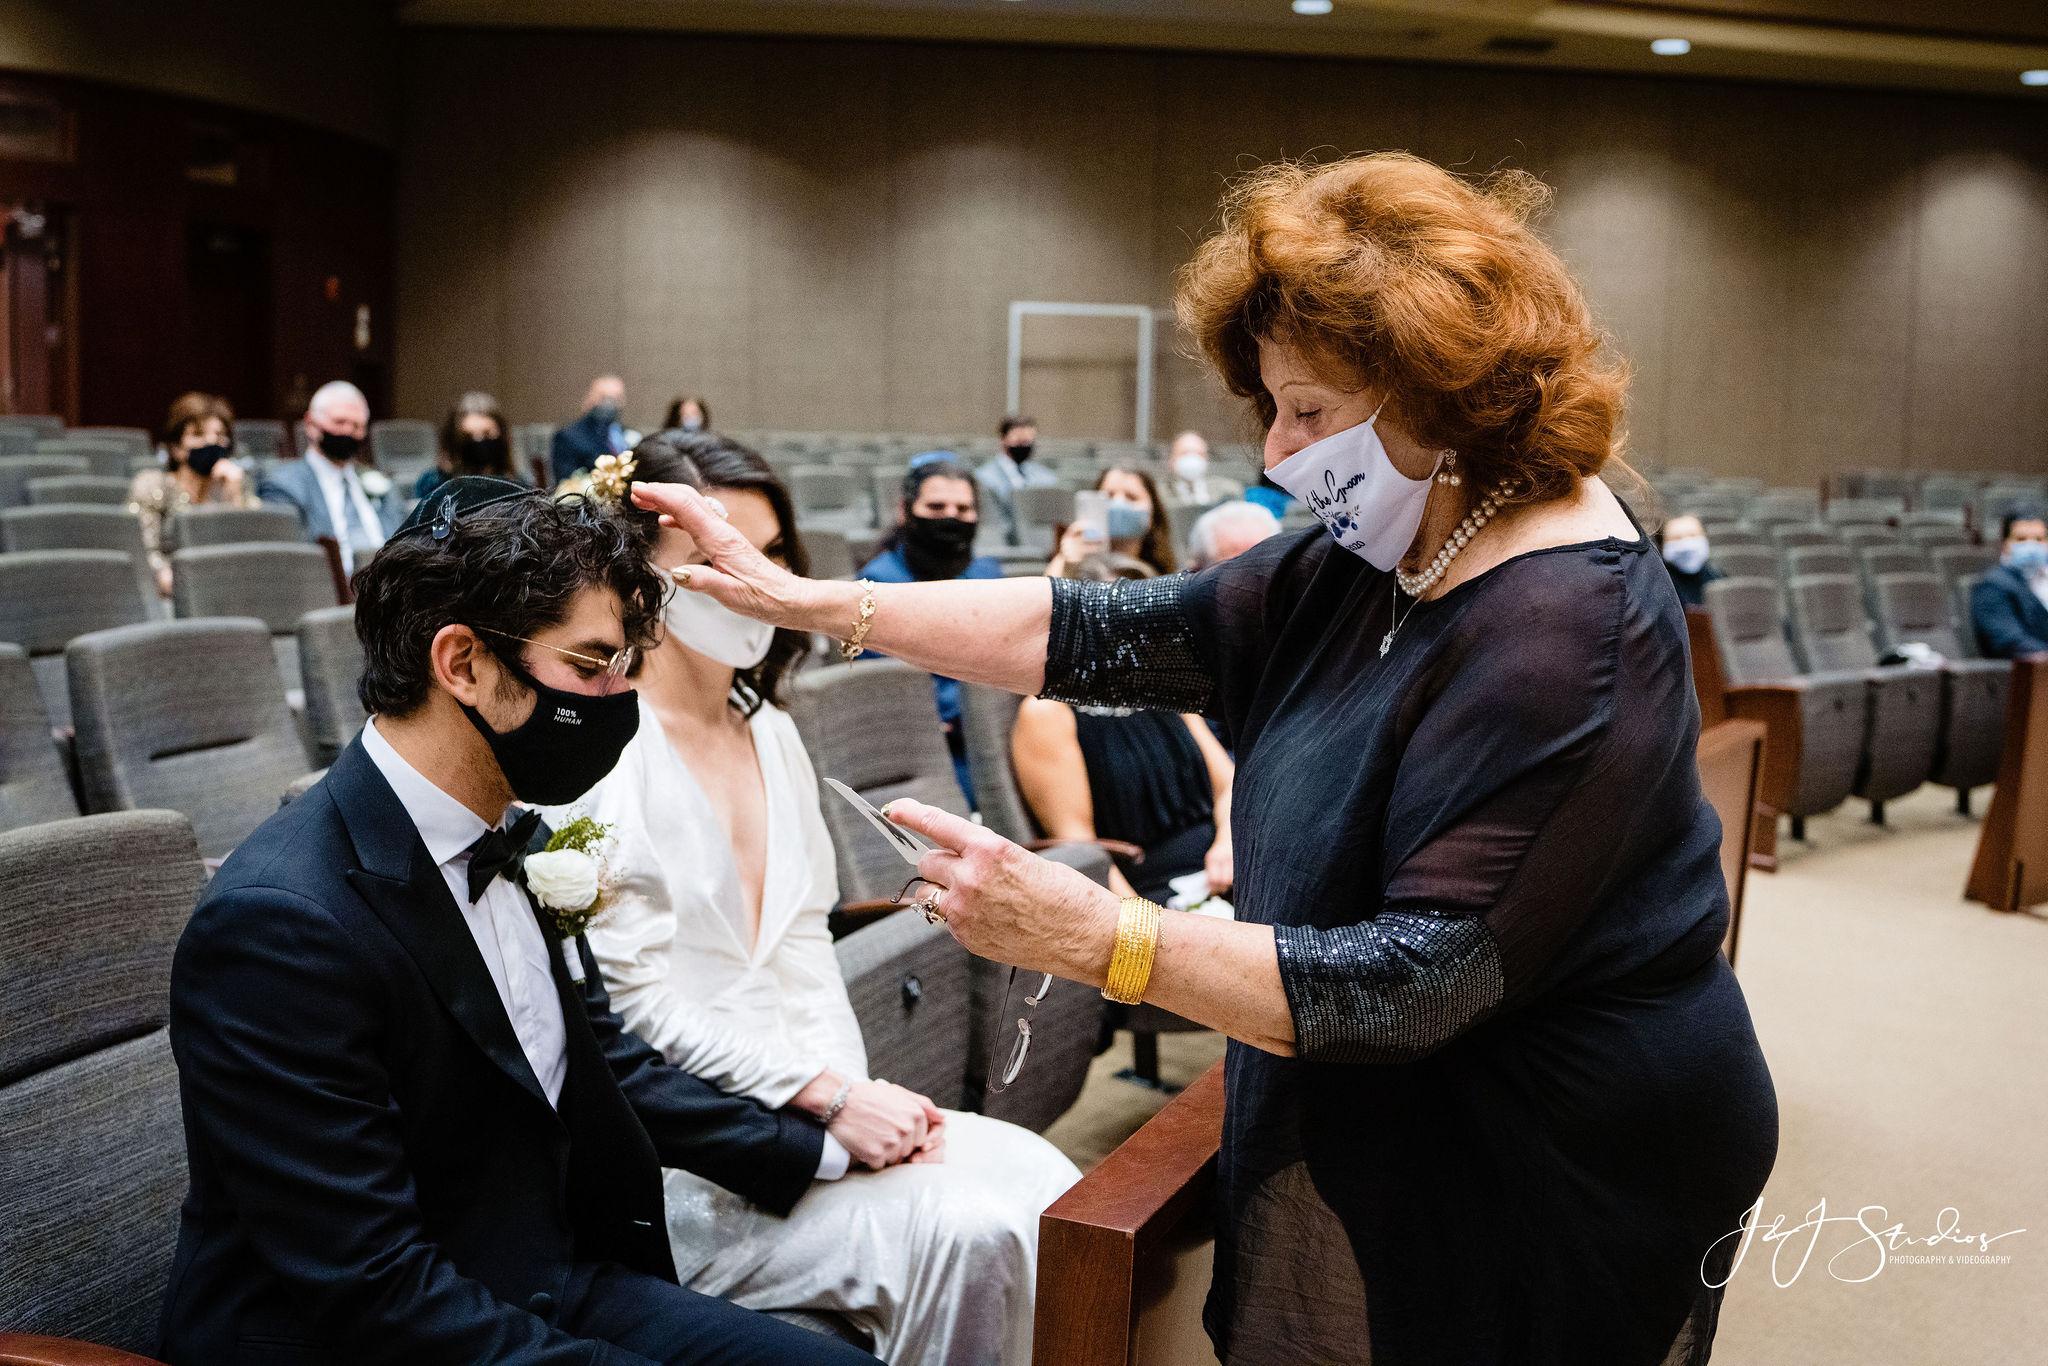 Woman  hand on groom's head during Jewish practice